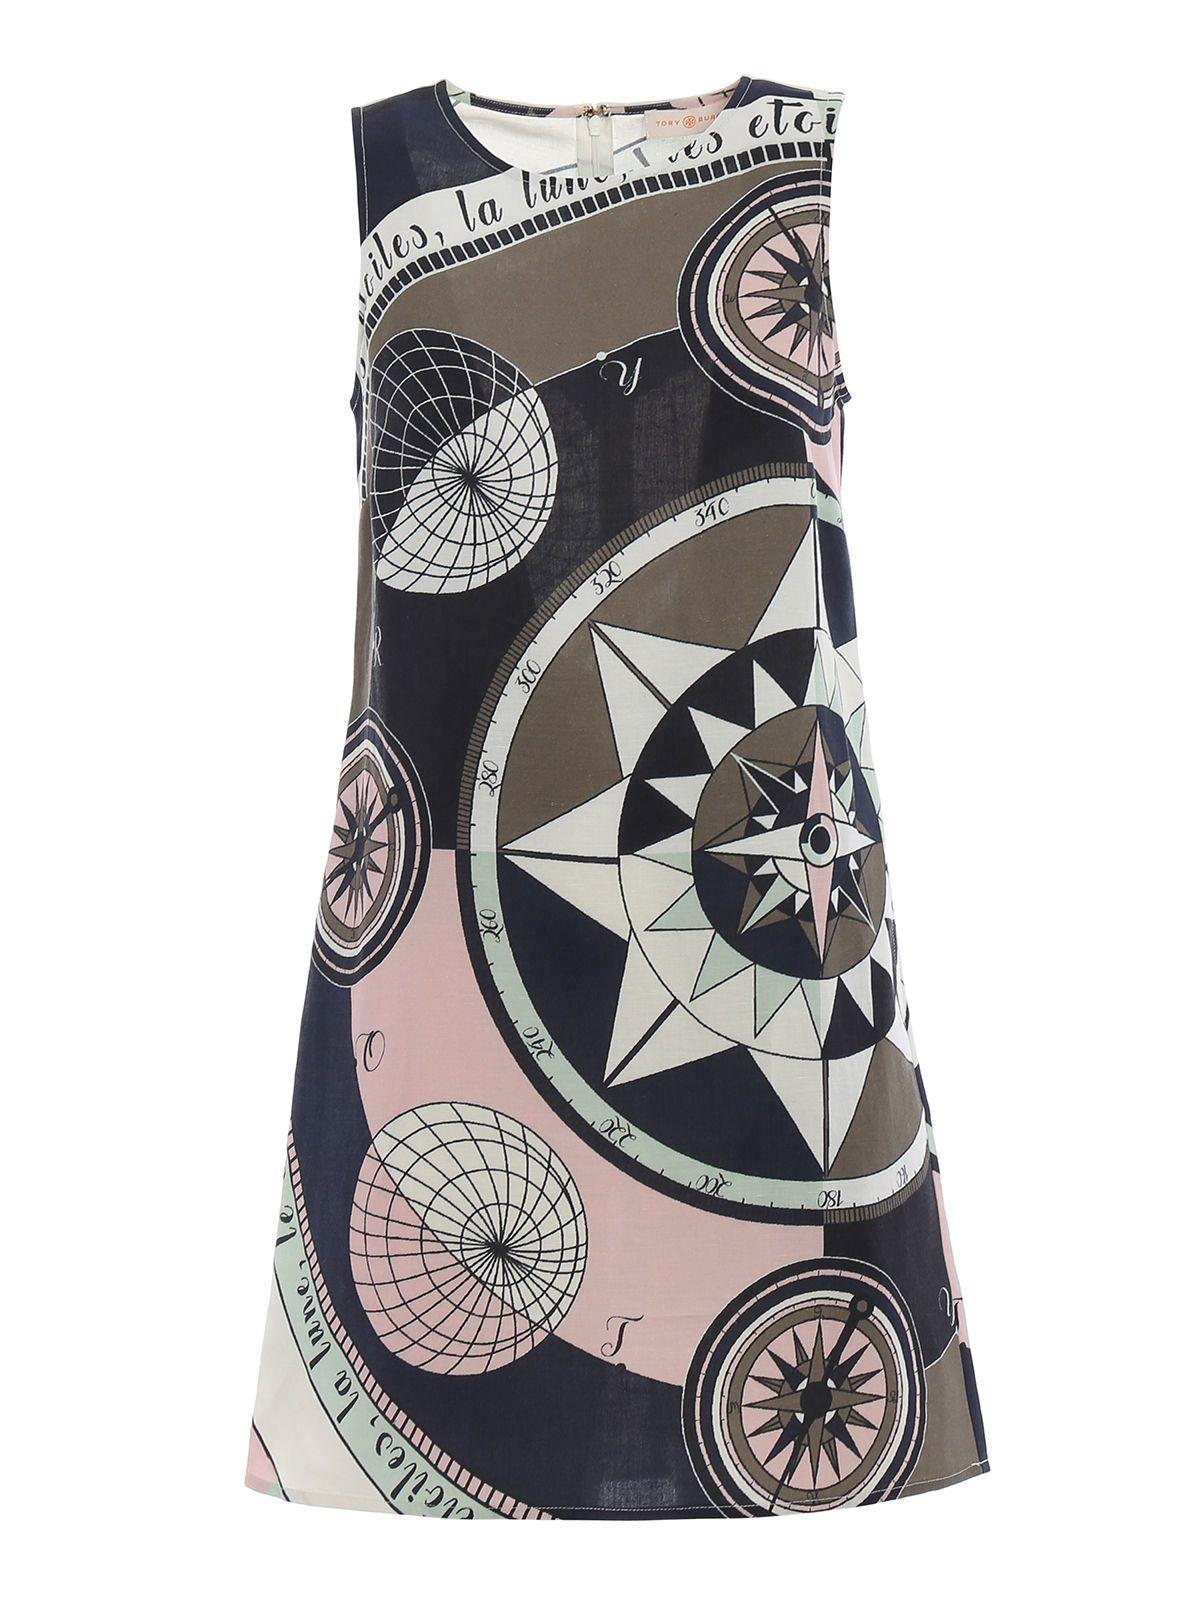 Tory Burch Linens COSMIC PRINT DRESS